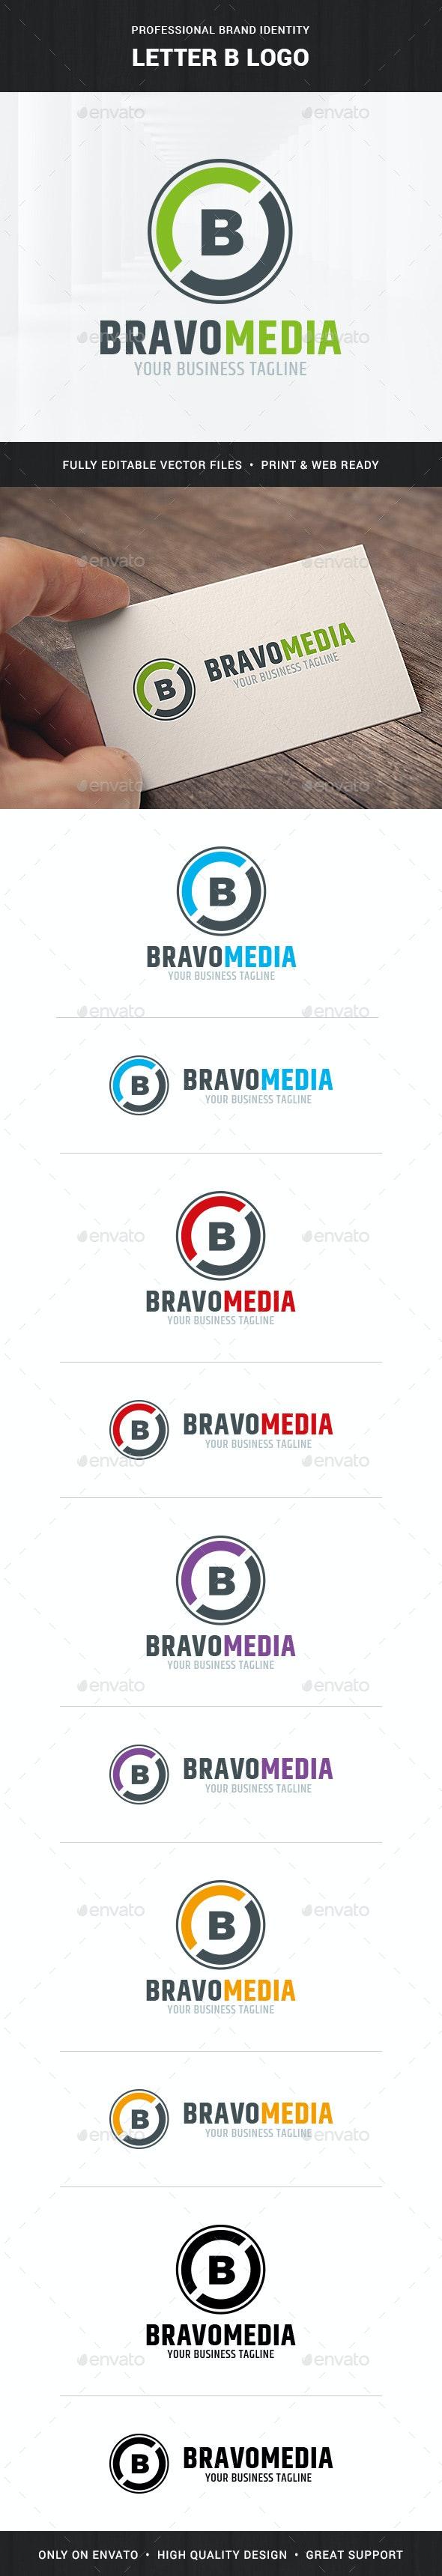 Letter B Logo Template - Letters Logo Templates